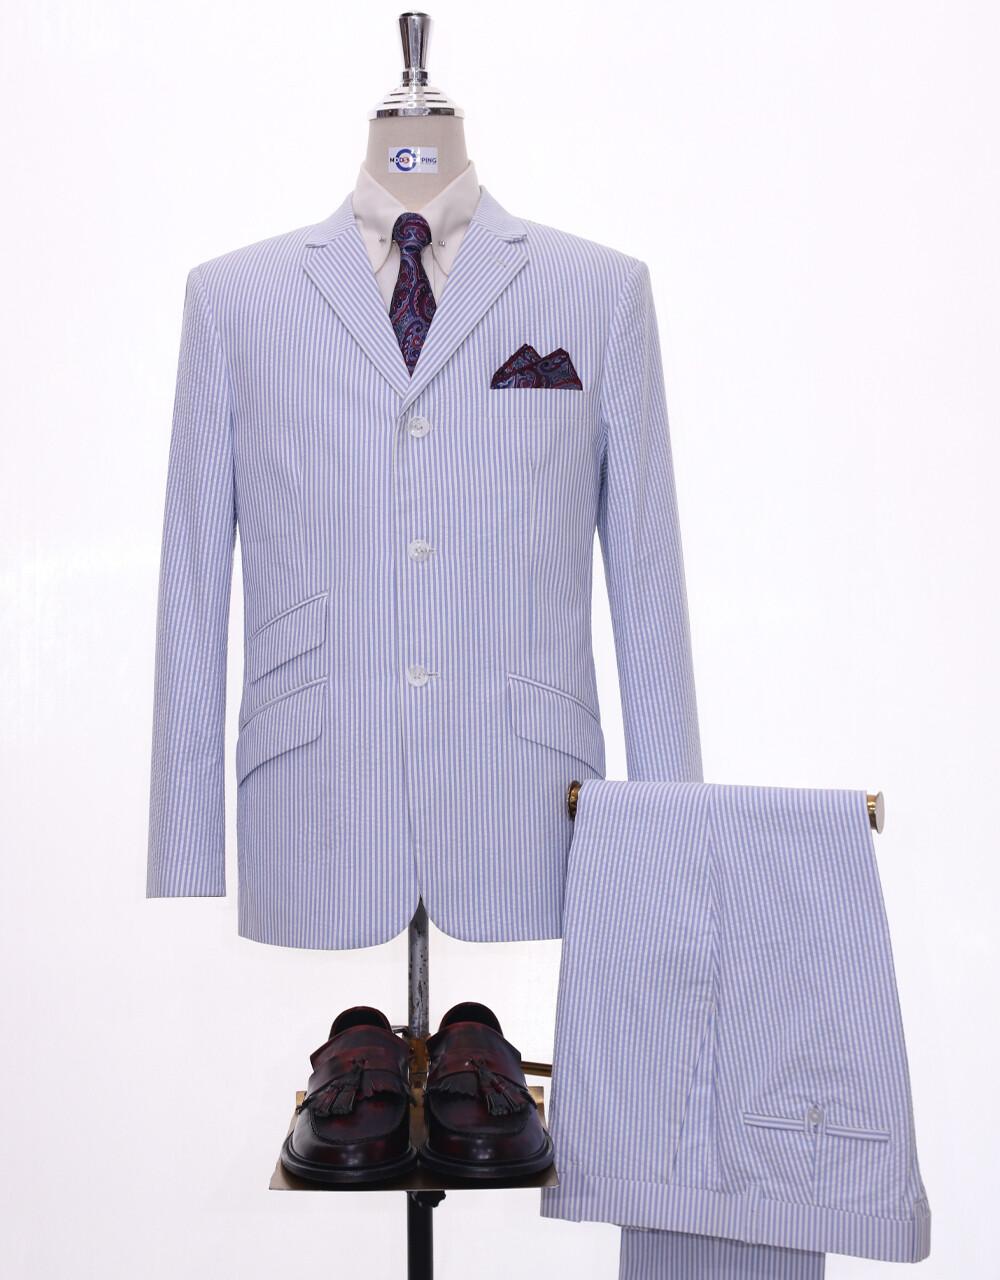 men seersucker suit tailored 3 button mod suit